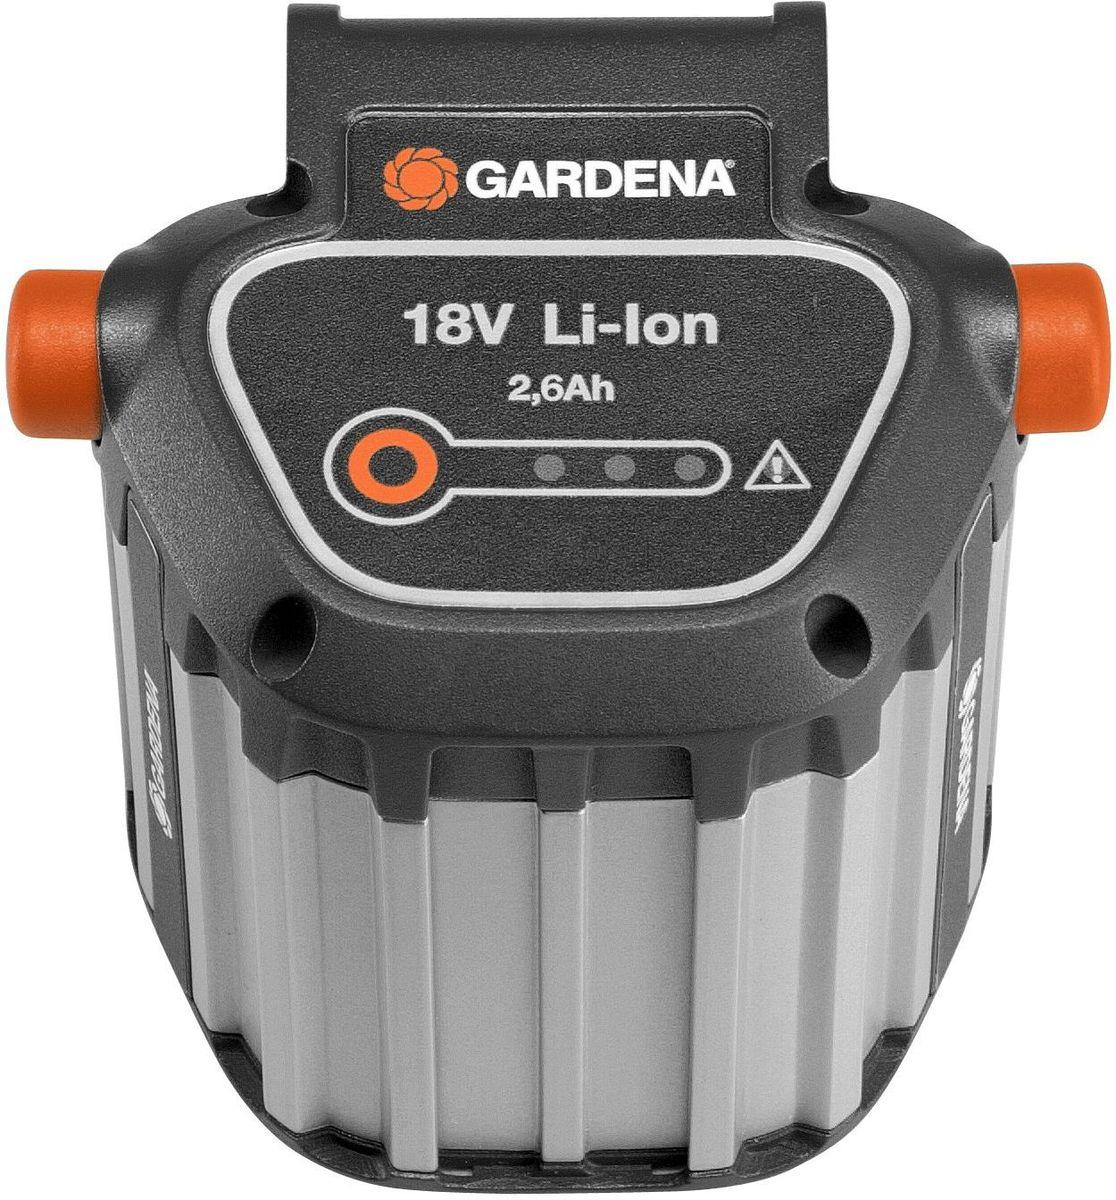 Аккумулятор Gardena BLi-18, литий-ионный аккумулятор gardena bli 40 100 09842 20 000 00